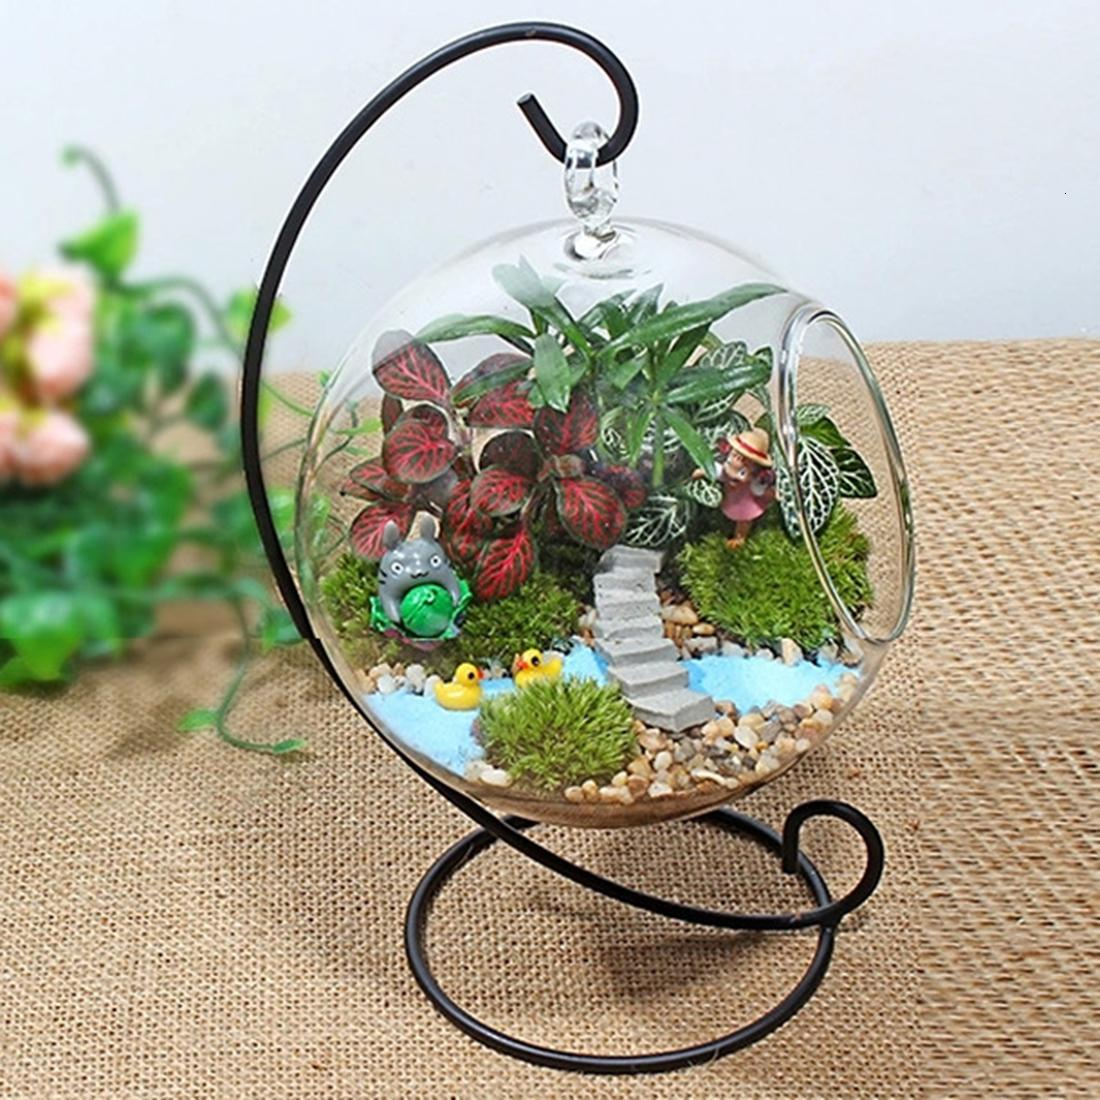 Creative Clear Glass Ball Vase Micro Landscape Air Plant Terrarium Succulent Hanging Flowerpot Container Flower Vases For Homes T191016